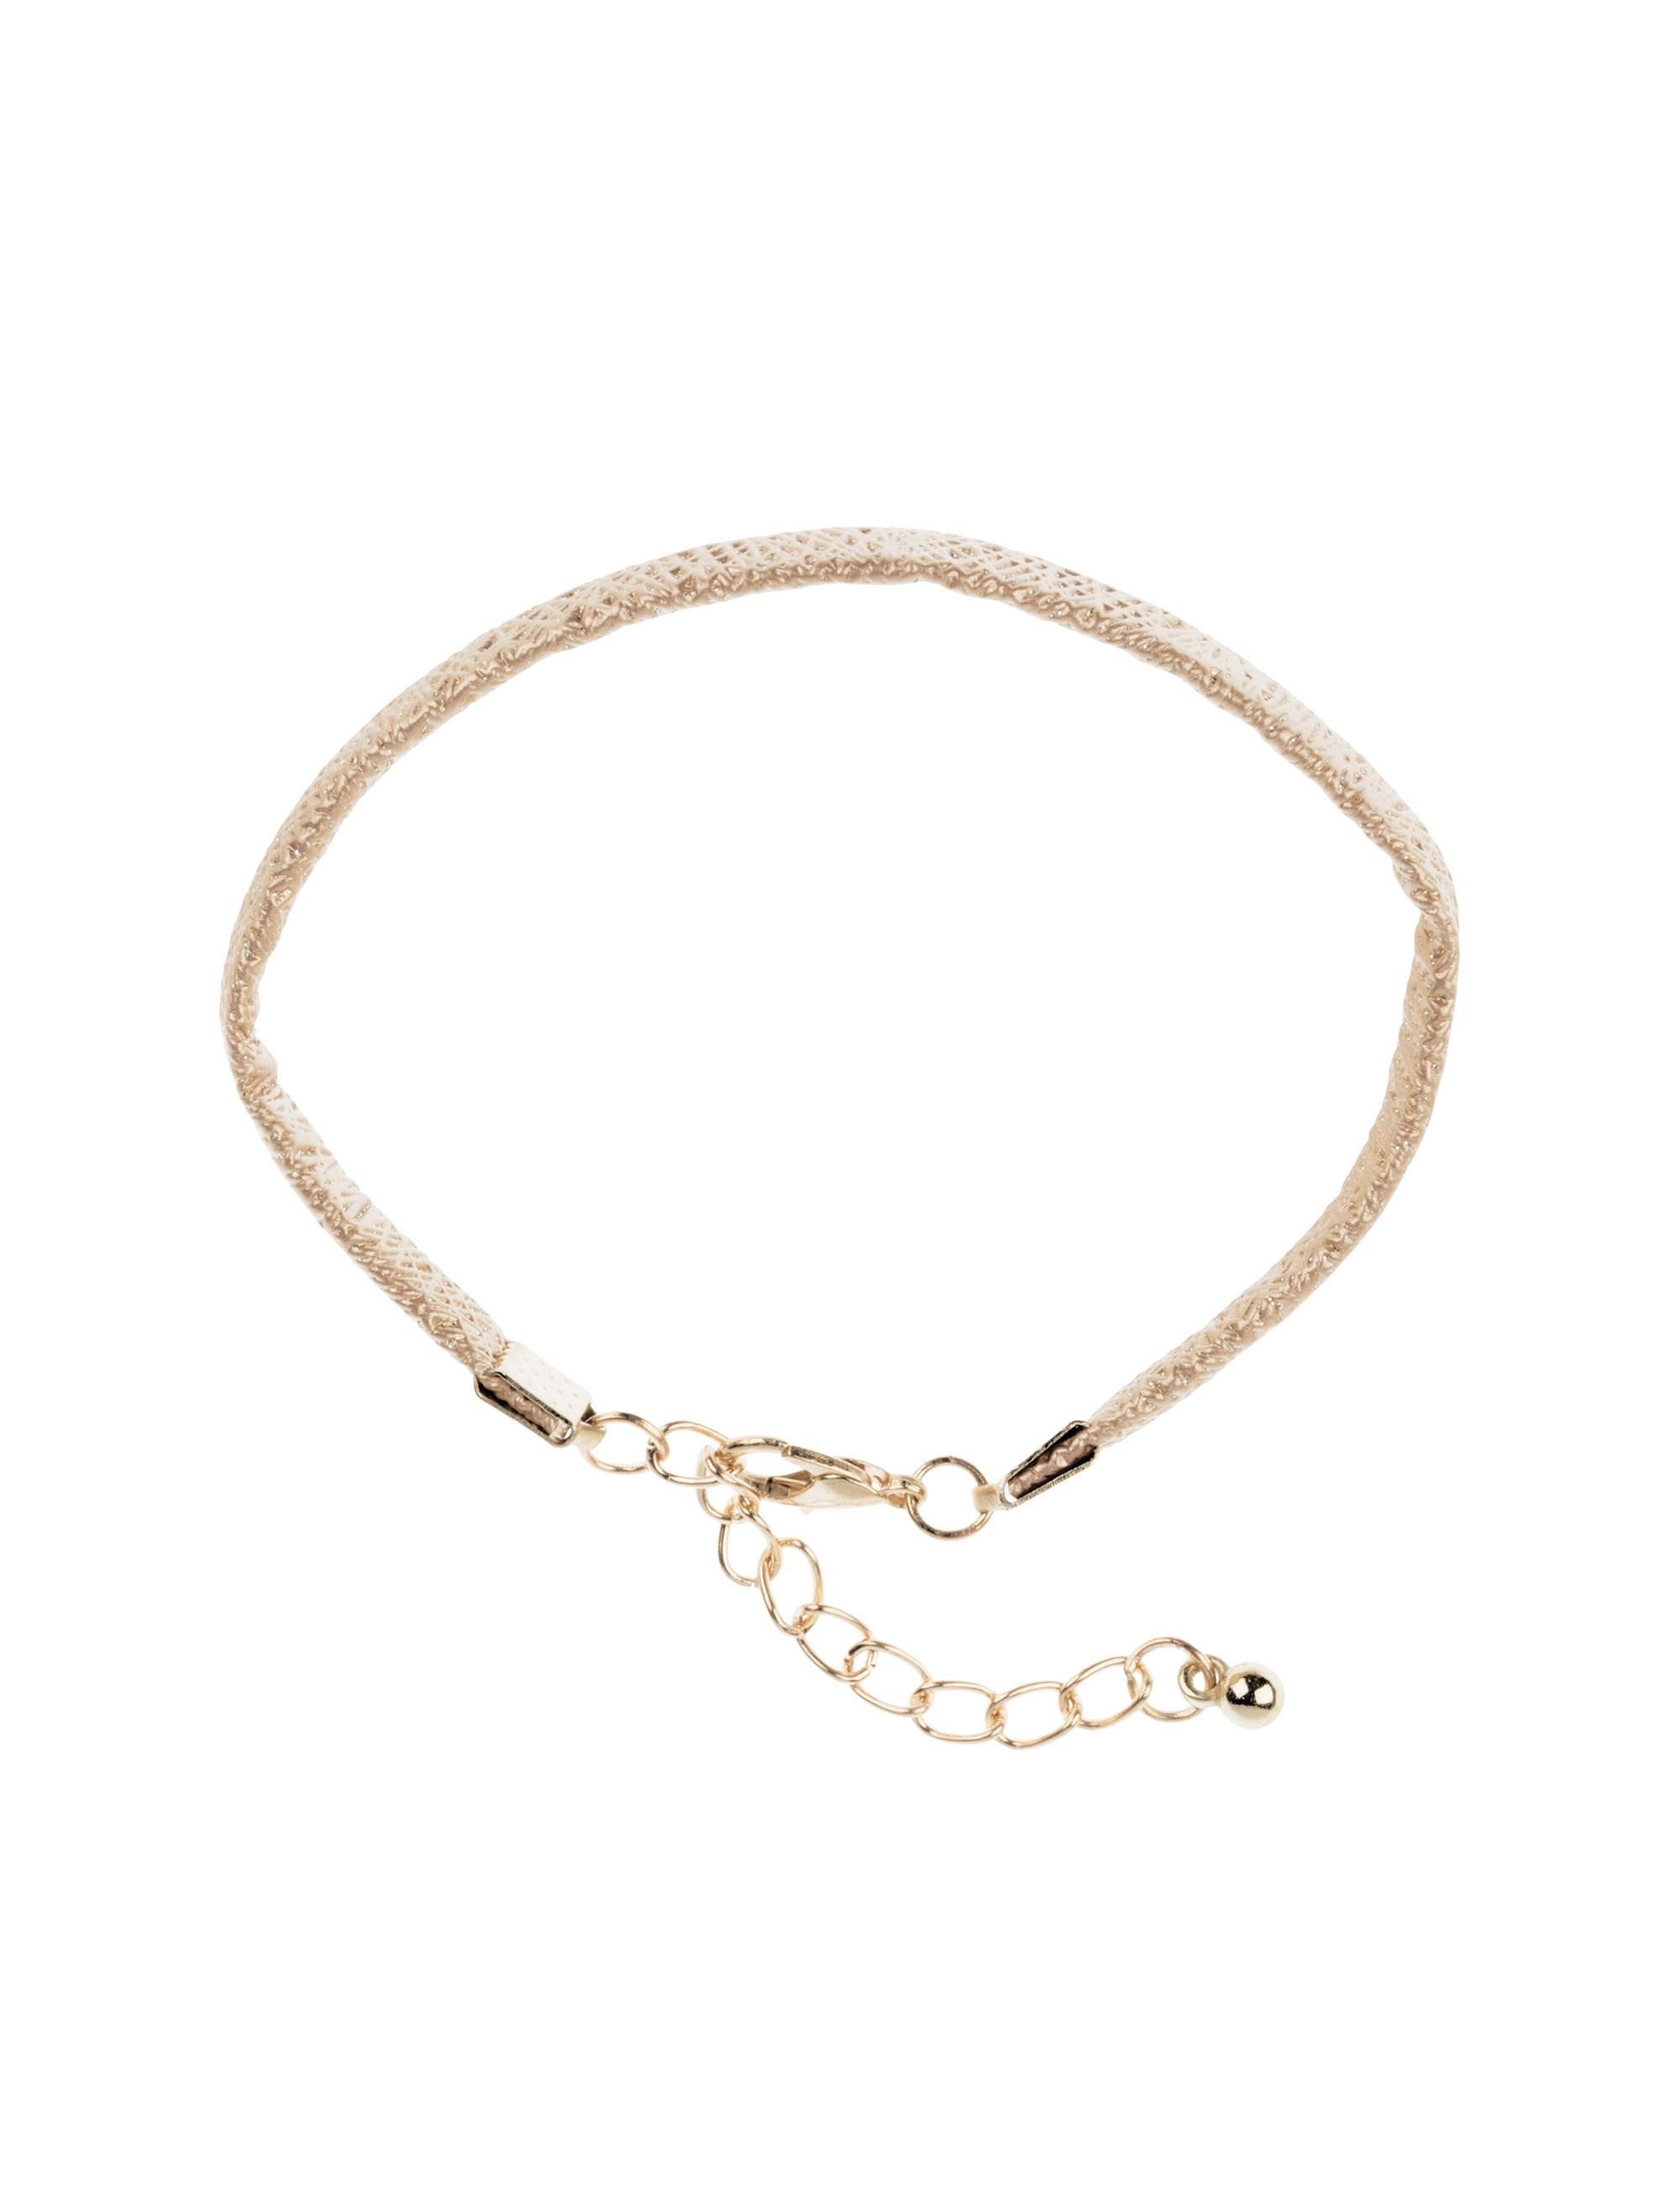 دستبند زنانه بسته 3 عددی - کوتون - طلايي/ طوسي - 11